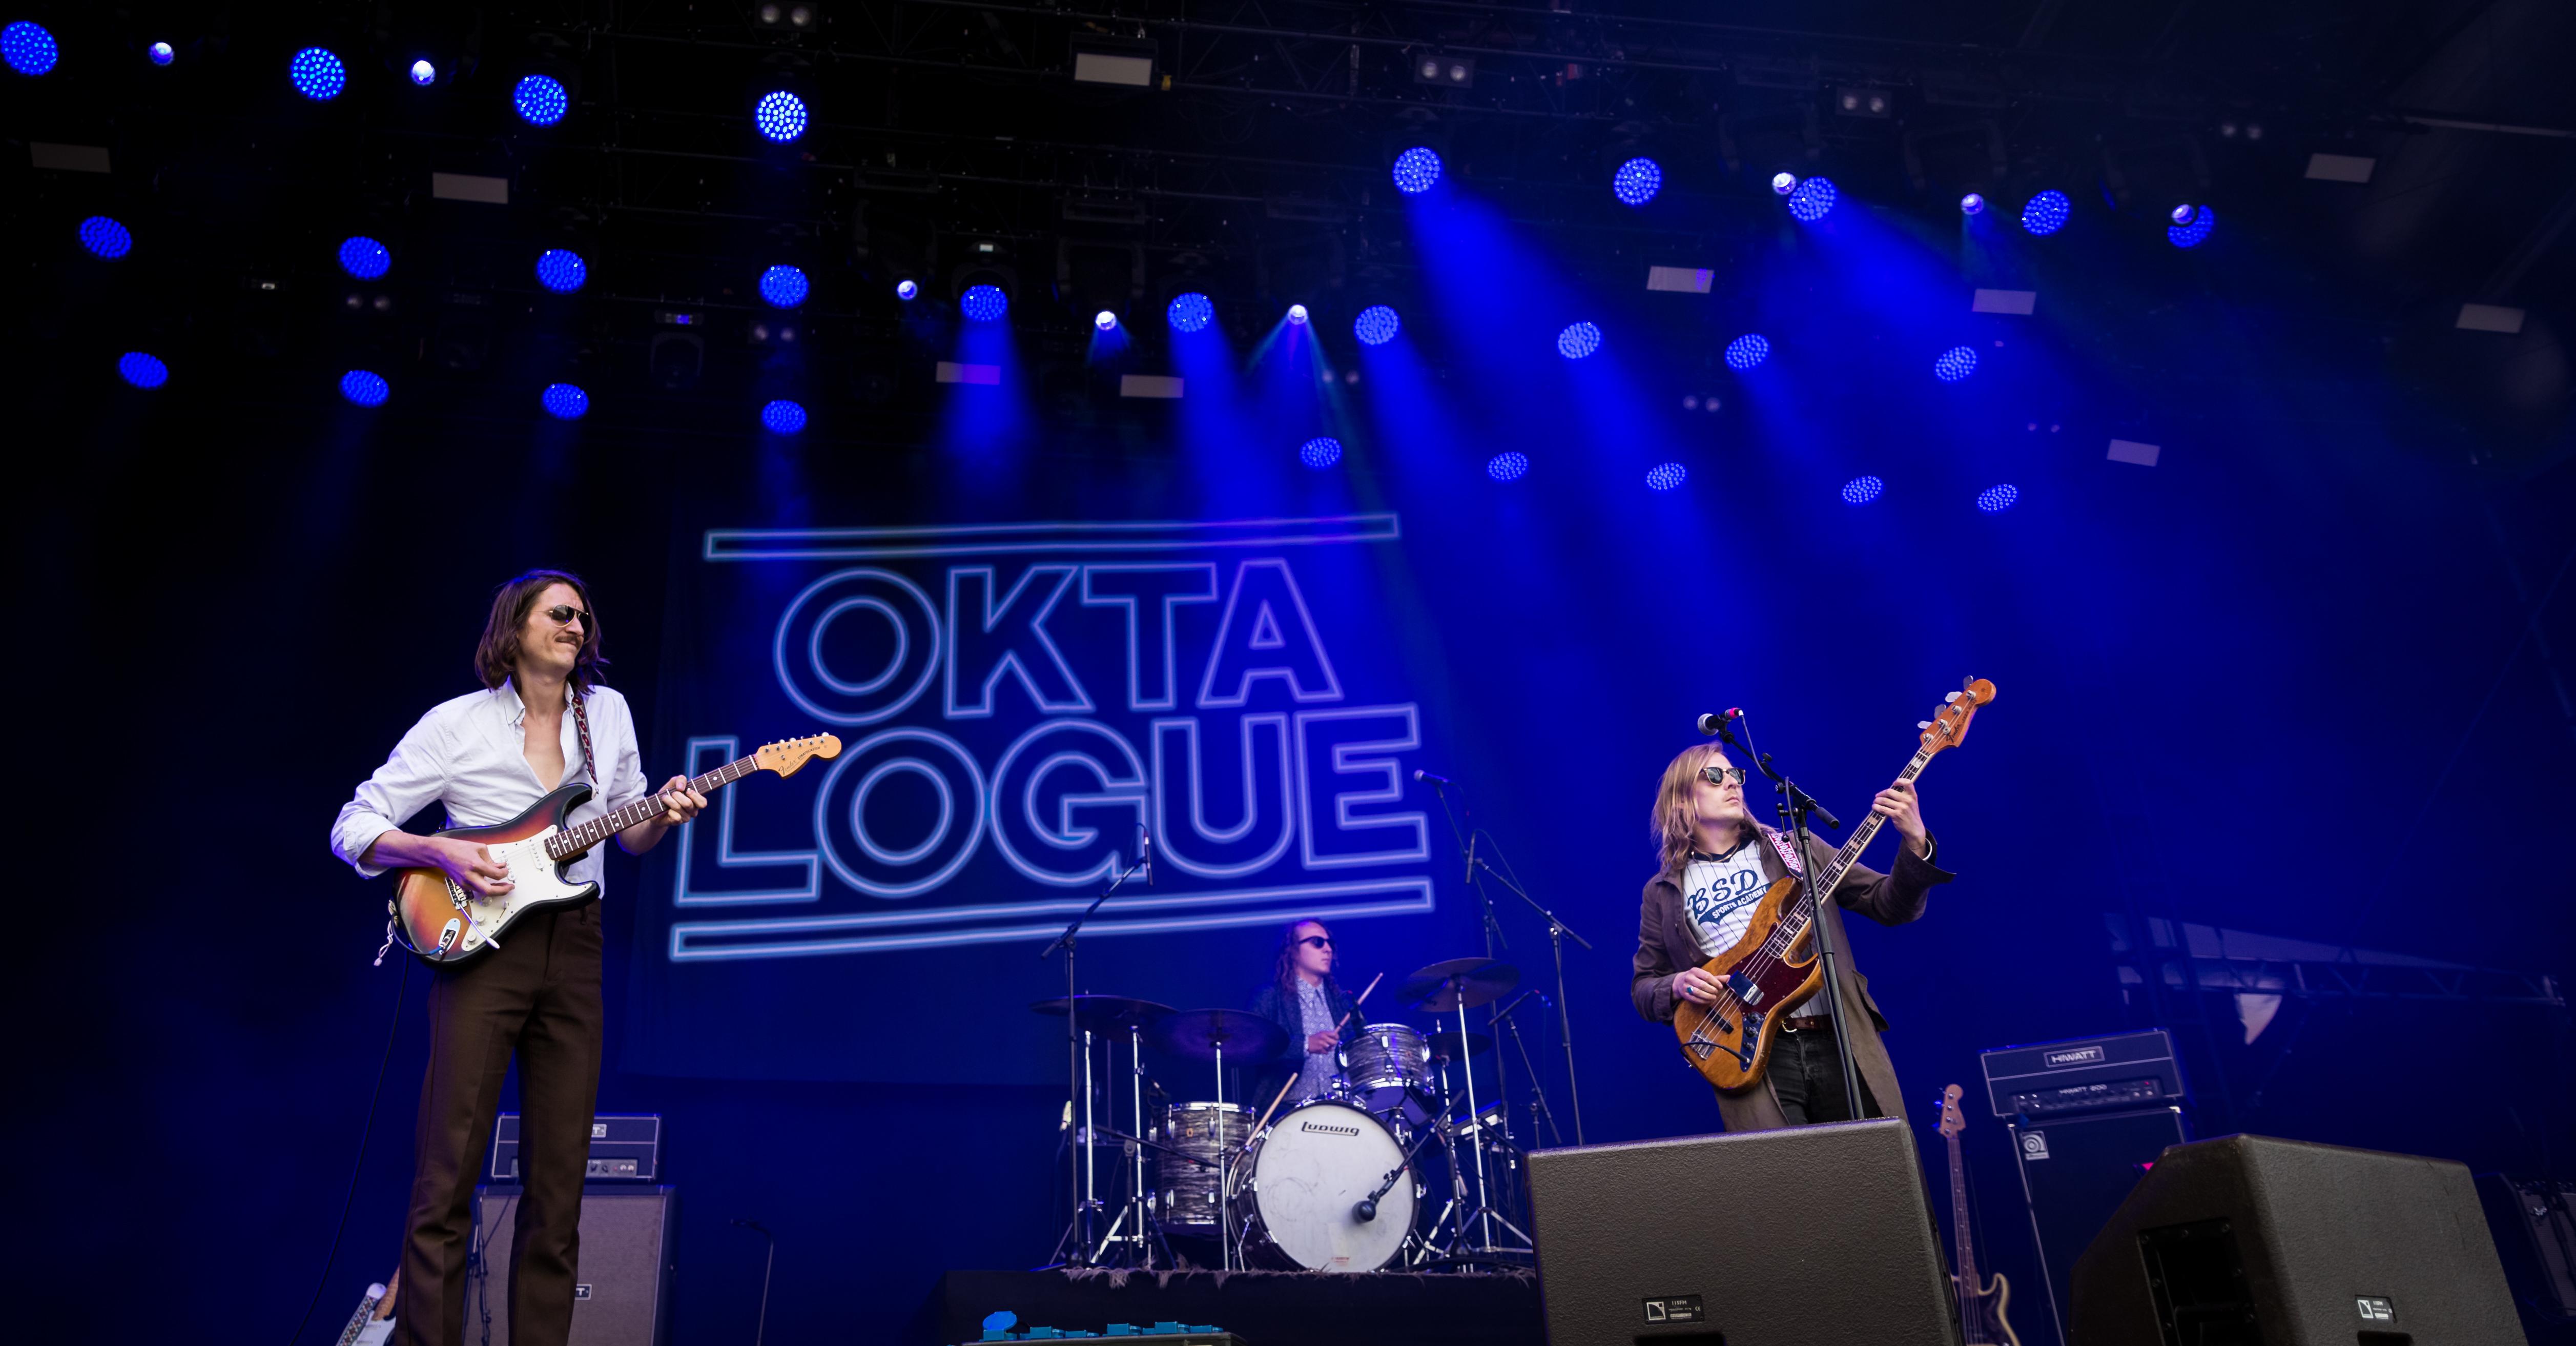 File:Okta Logue - Rock am Ring 2017-AL3329 jpg - Wikimedia